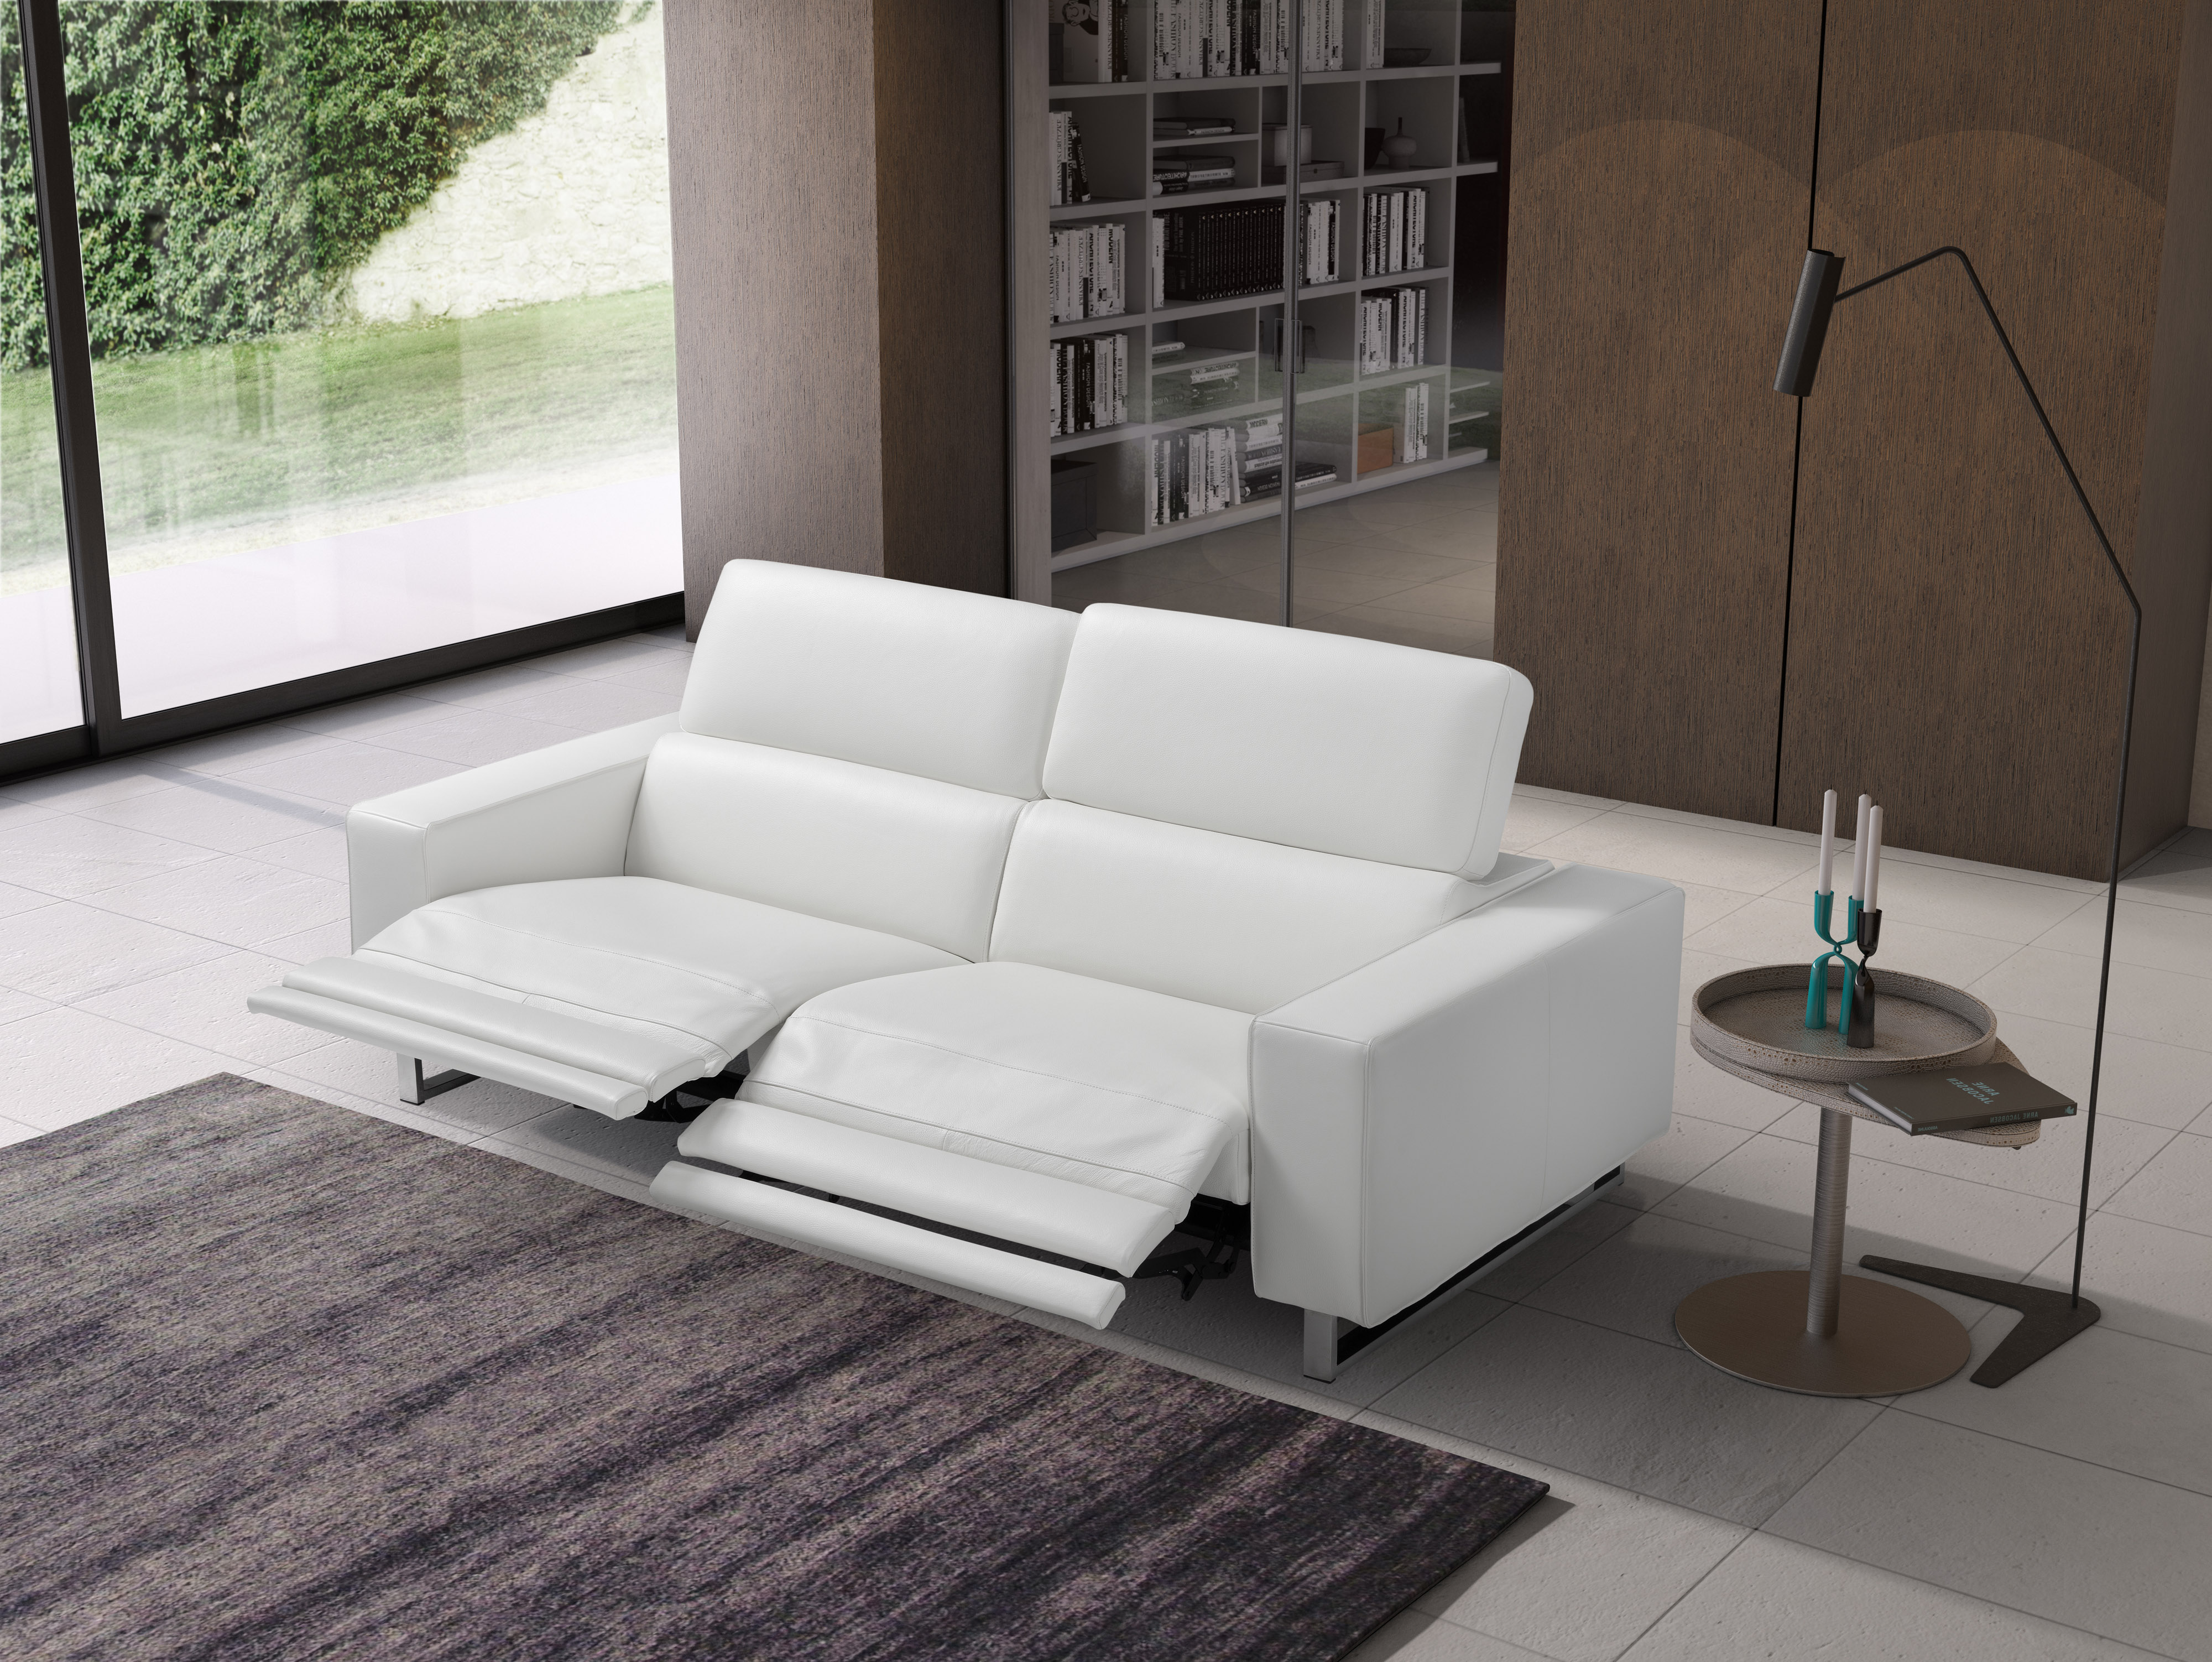 Astounding Grace White Leather Sofa Set With Adjustable Headrests Machost Co Dining Chair Design Ideas Machostcouk